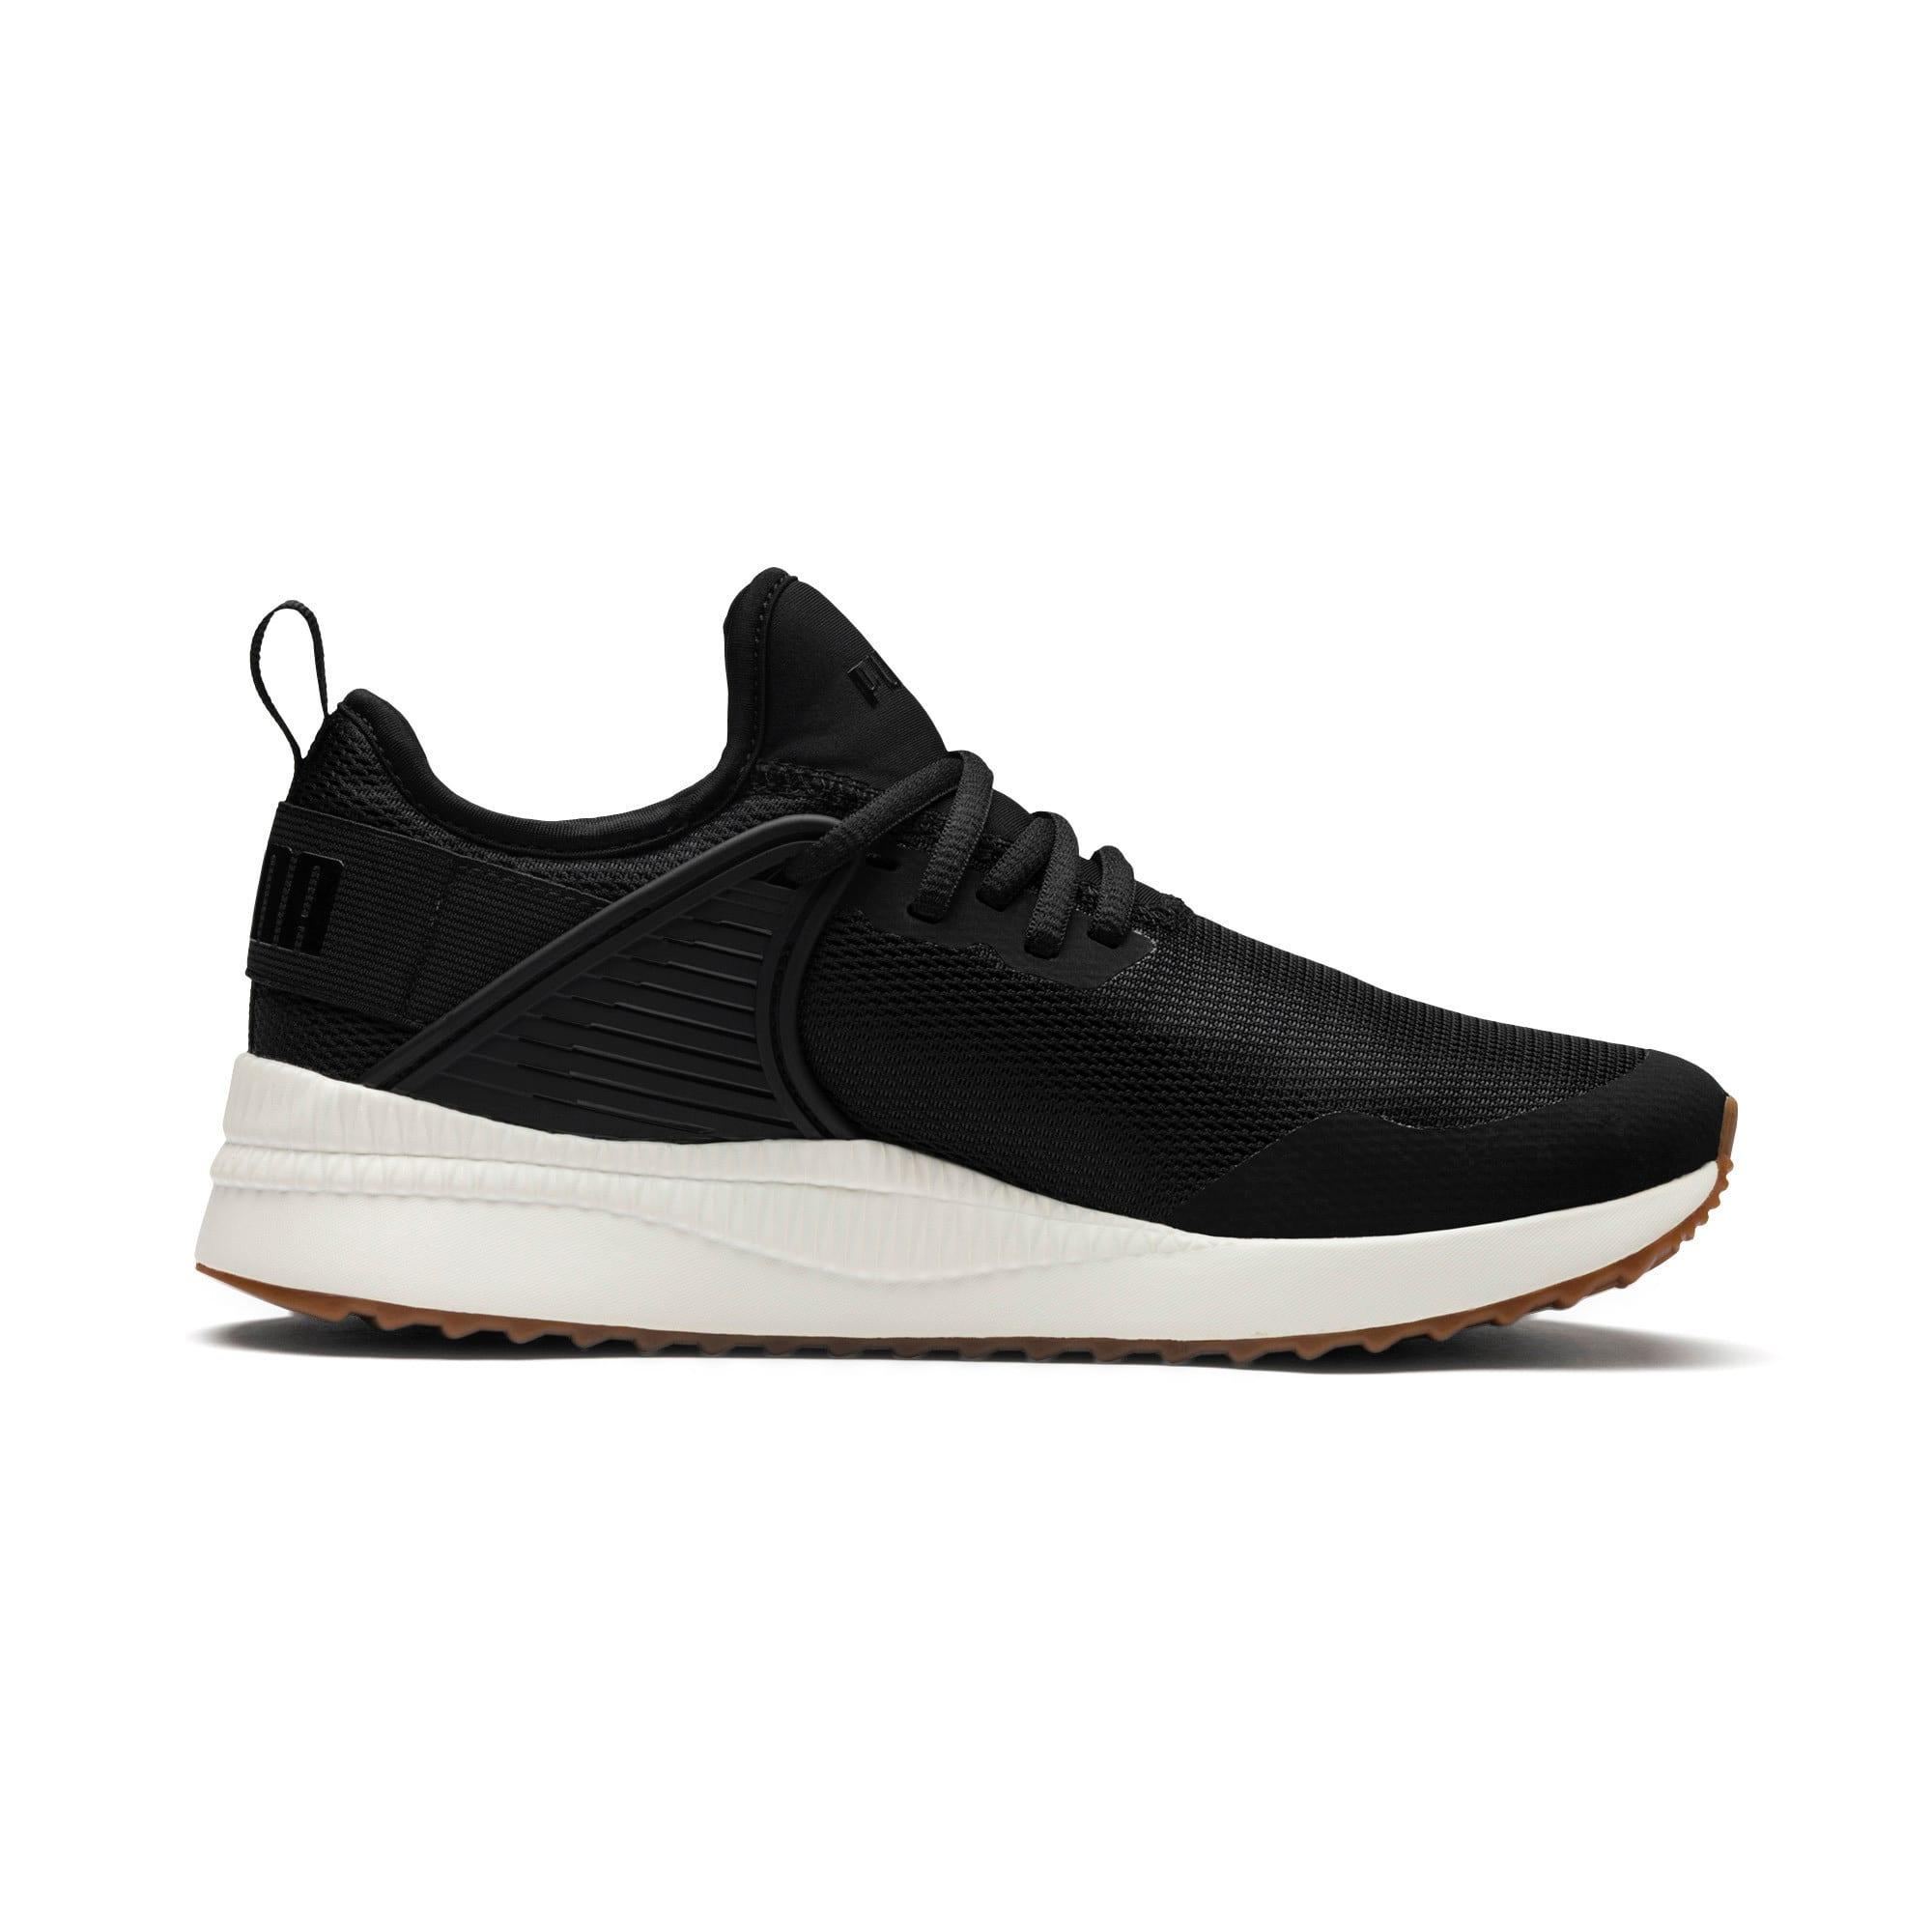 Thumbnail 5 of Pacer Next Cage Sneakers, P. Black-P. Black-Whis.White, medium